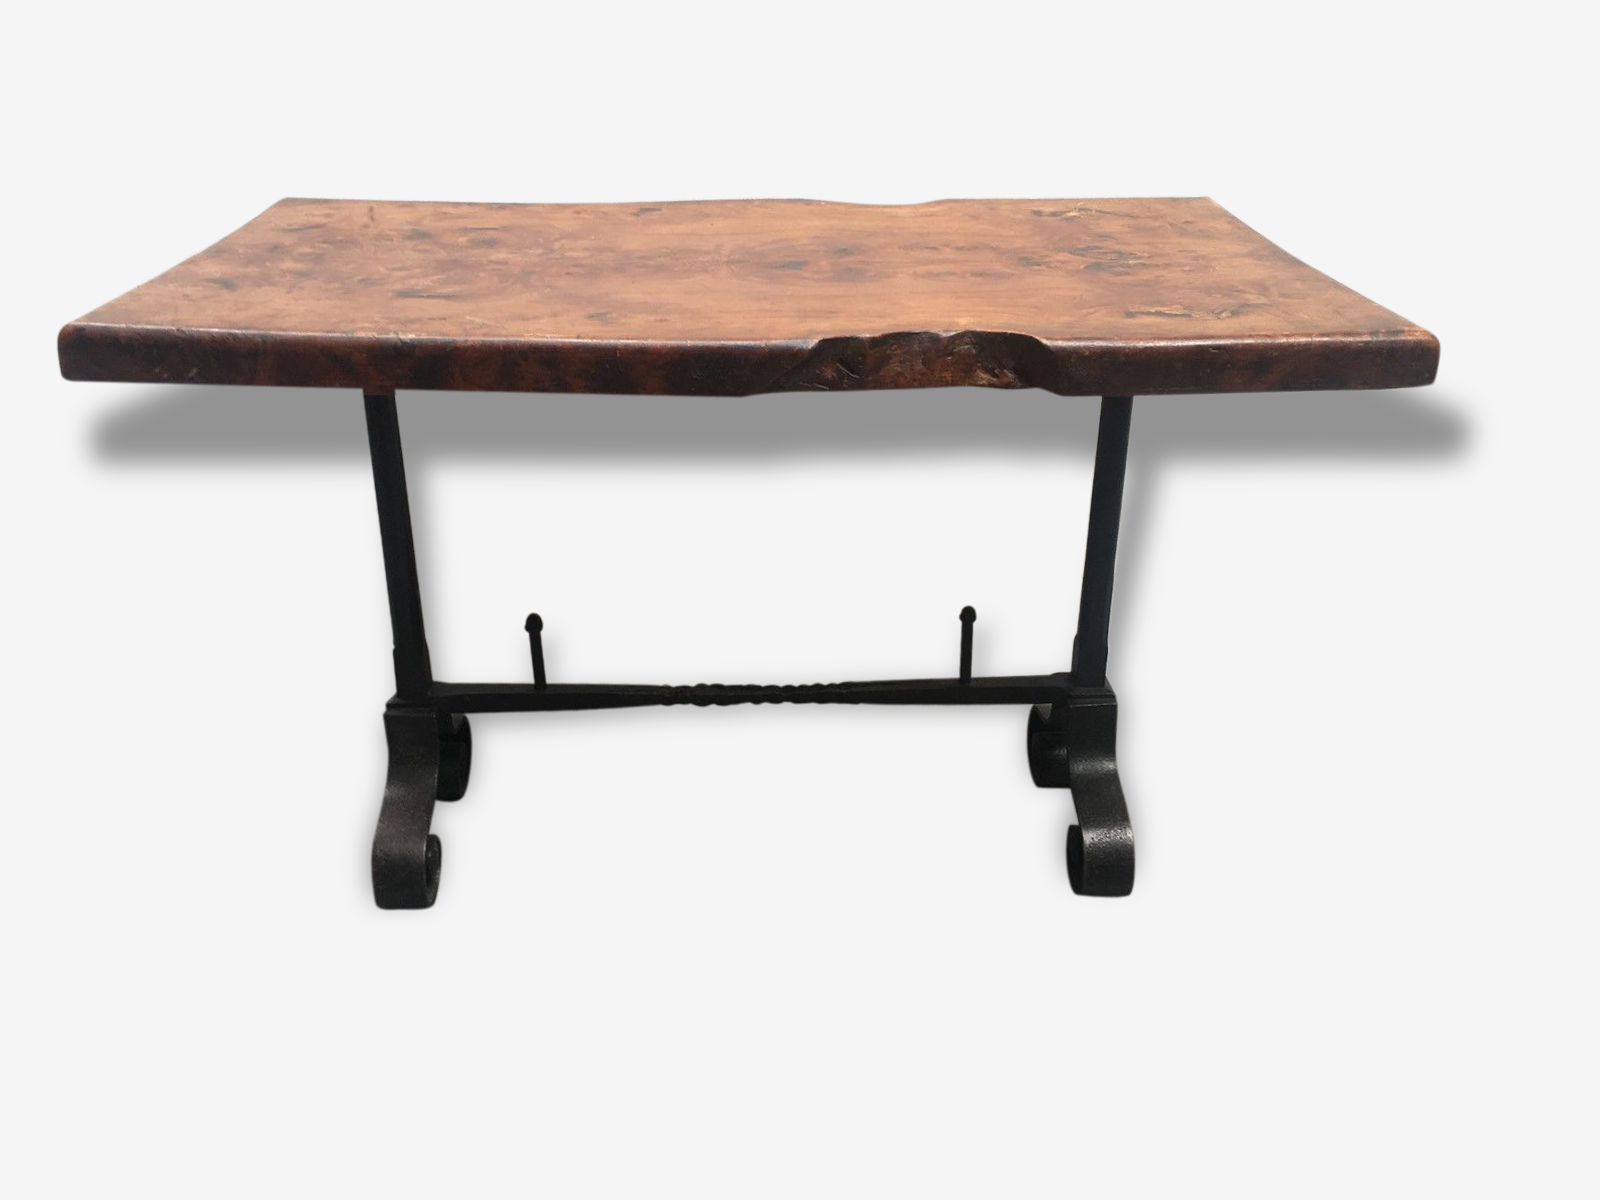 Table basse en bois et fer martelé